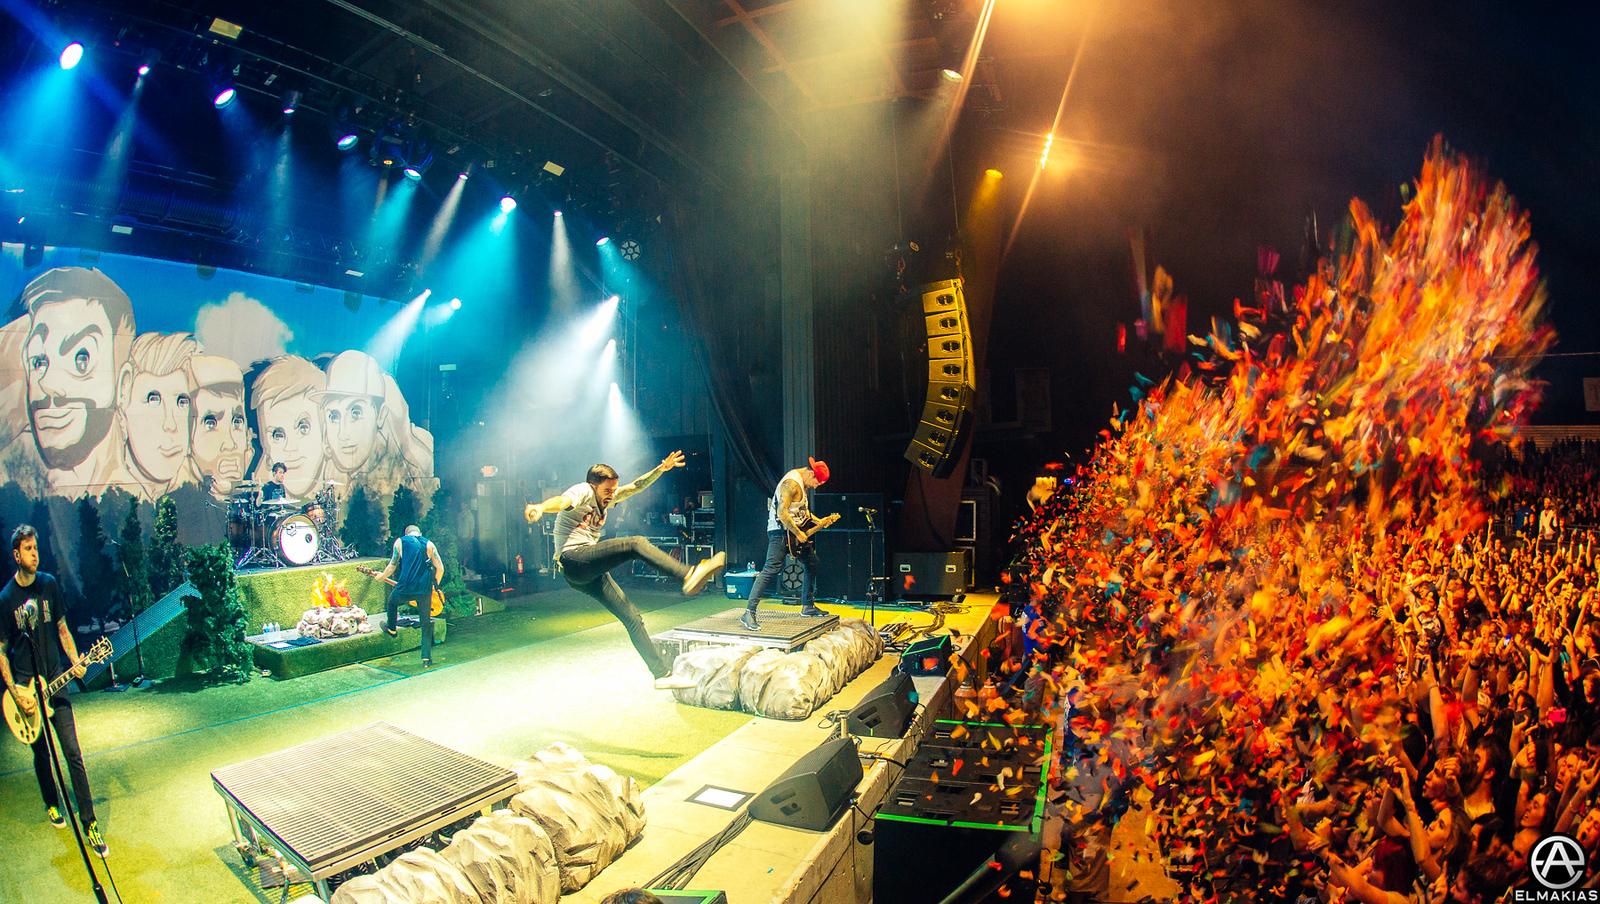 Flying kick and confetti shot